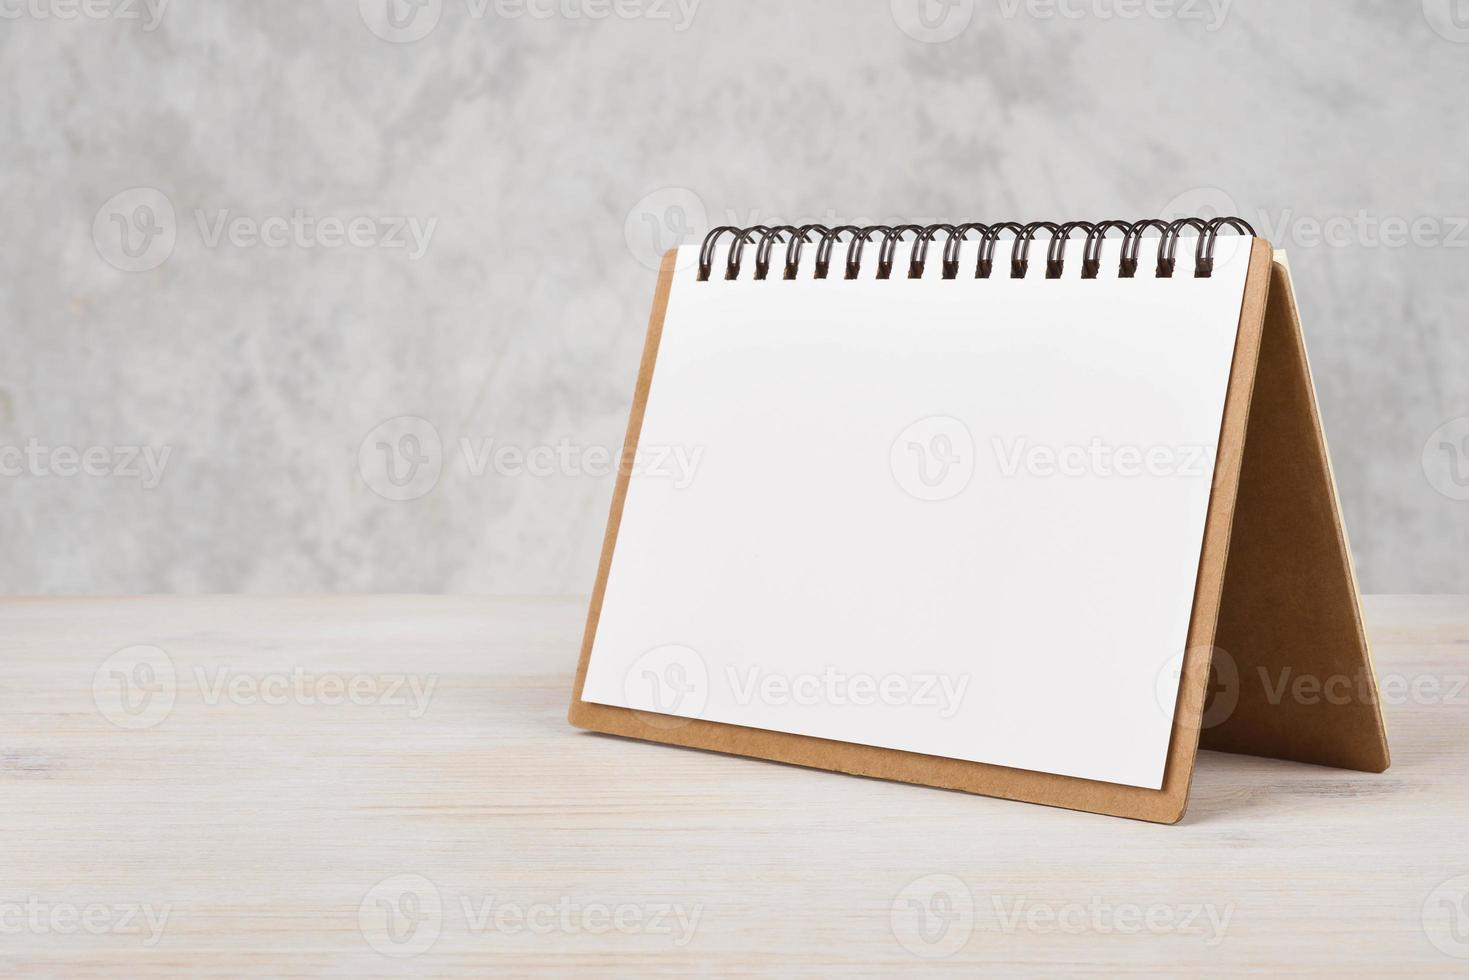 calendario de papel en blanco sobre mesa de madera foto